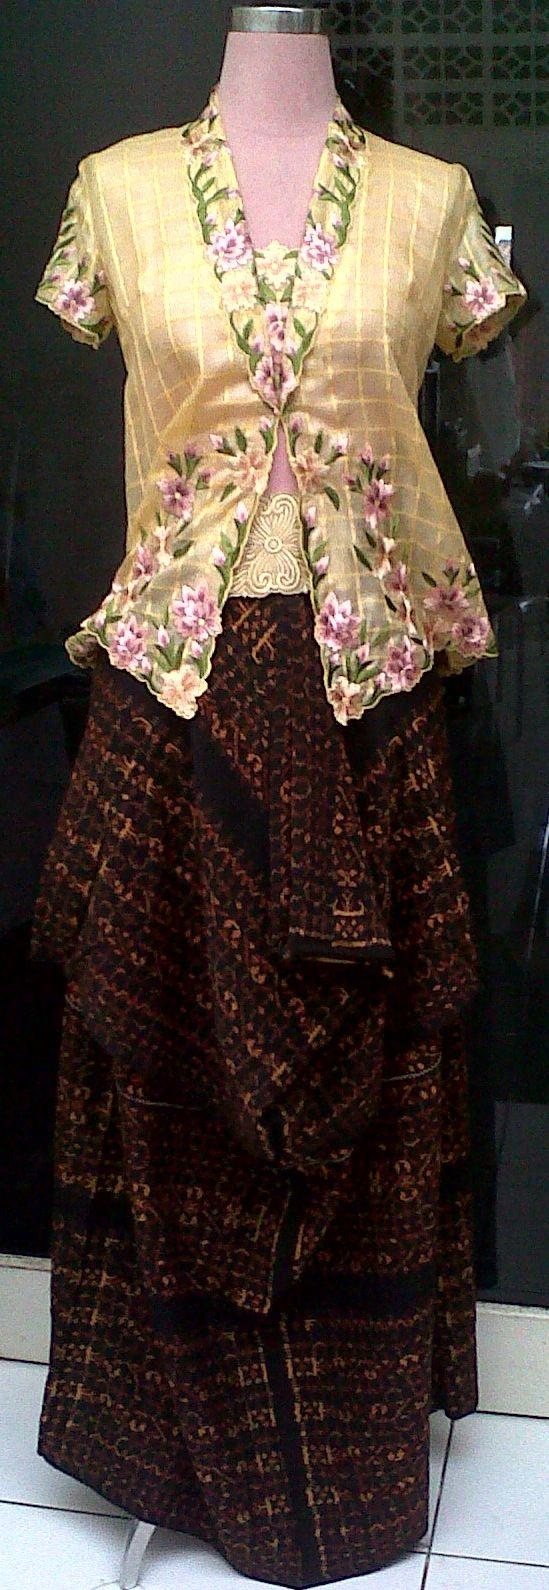 Kebaya embroidery with Sarong fr Flores ( Ende )